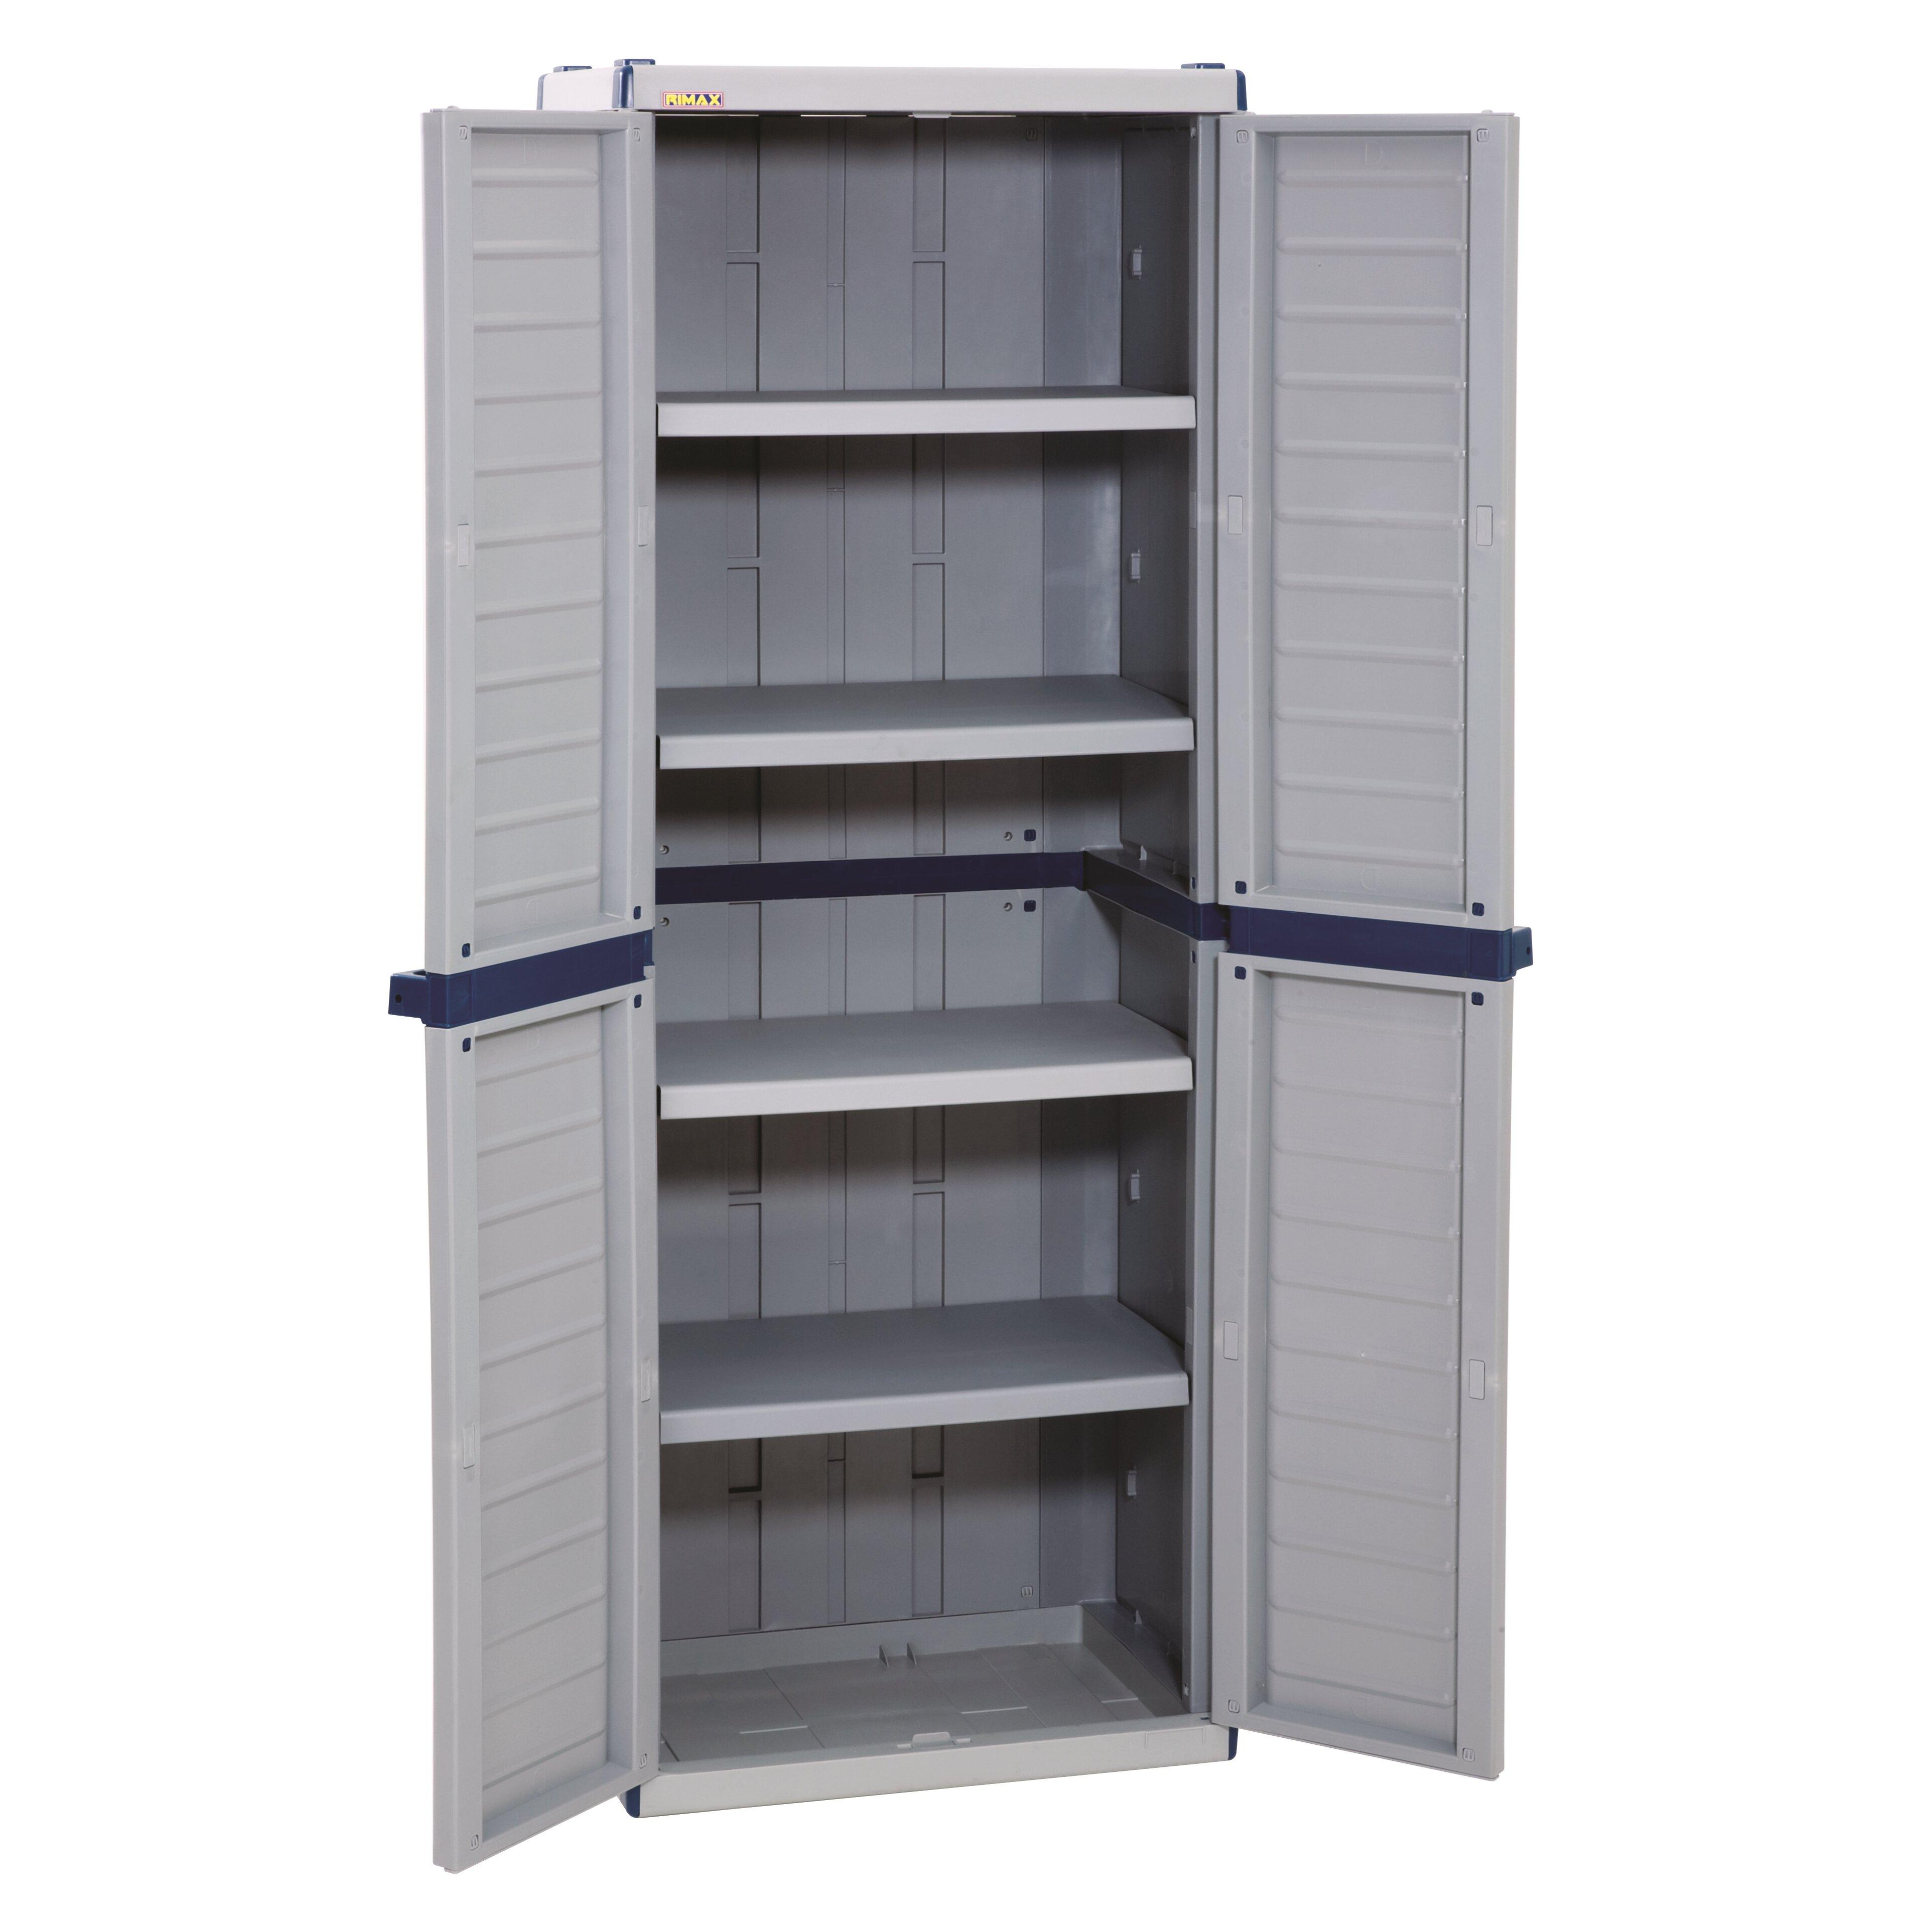 "Artesanato Em Origami Passo A Passo ~ 72"" H x 25 6"" W x 17 7"" D Storage Cabinet Wayfair"